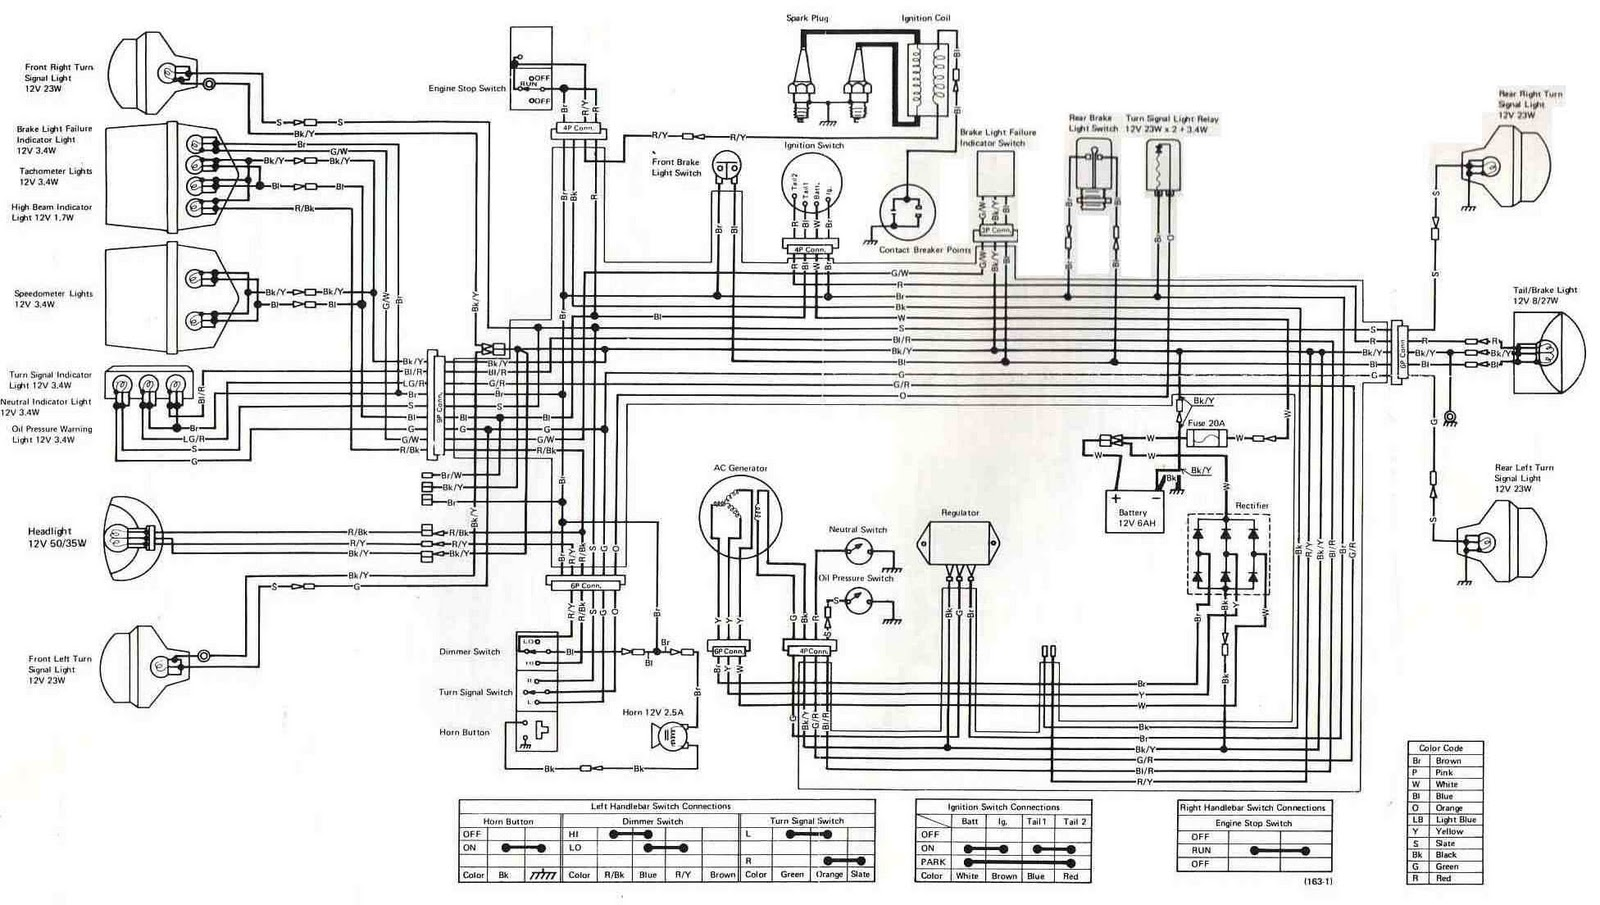 1981 kawasaki kz440 wiring diagram wiring library 1981 kz440 wiring diagram [ 1600 x 905 Pixel ]